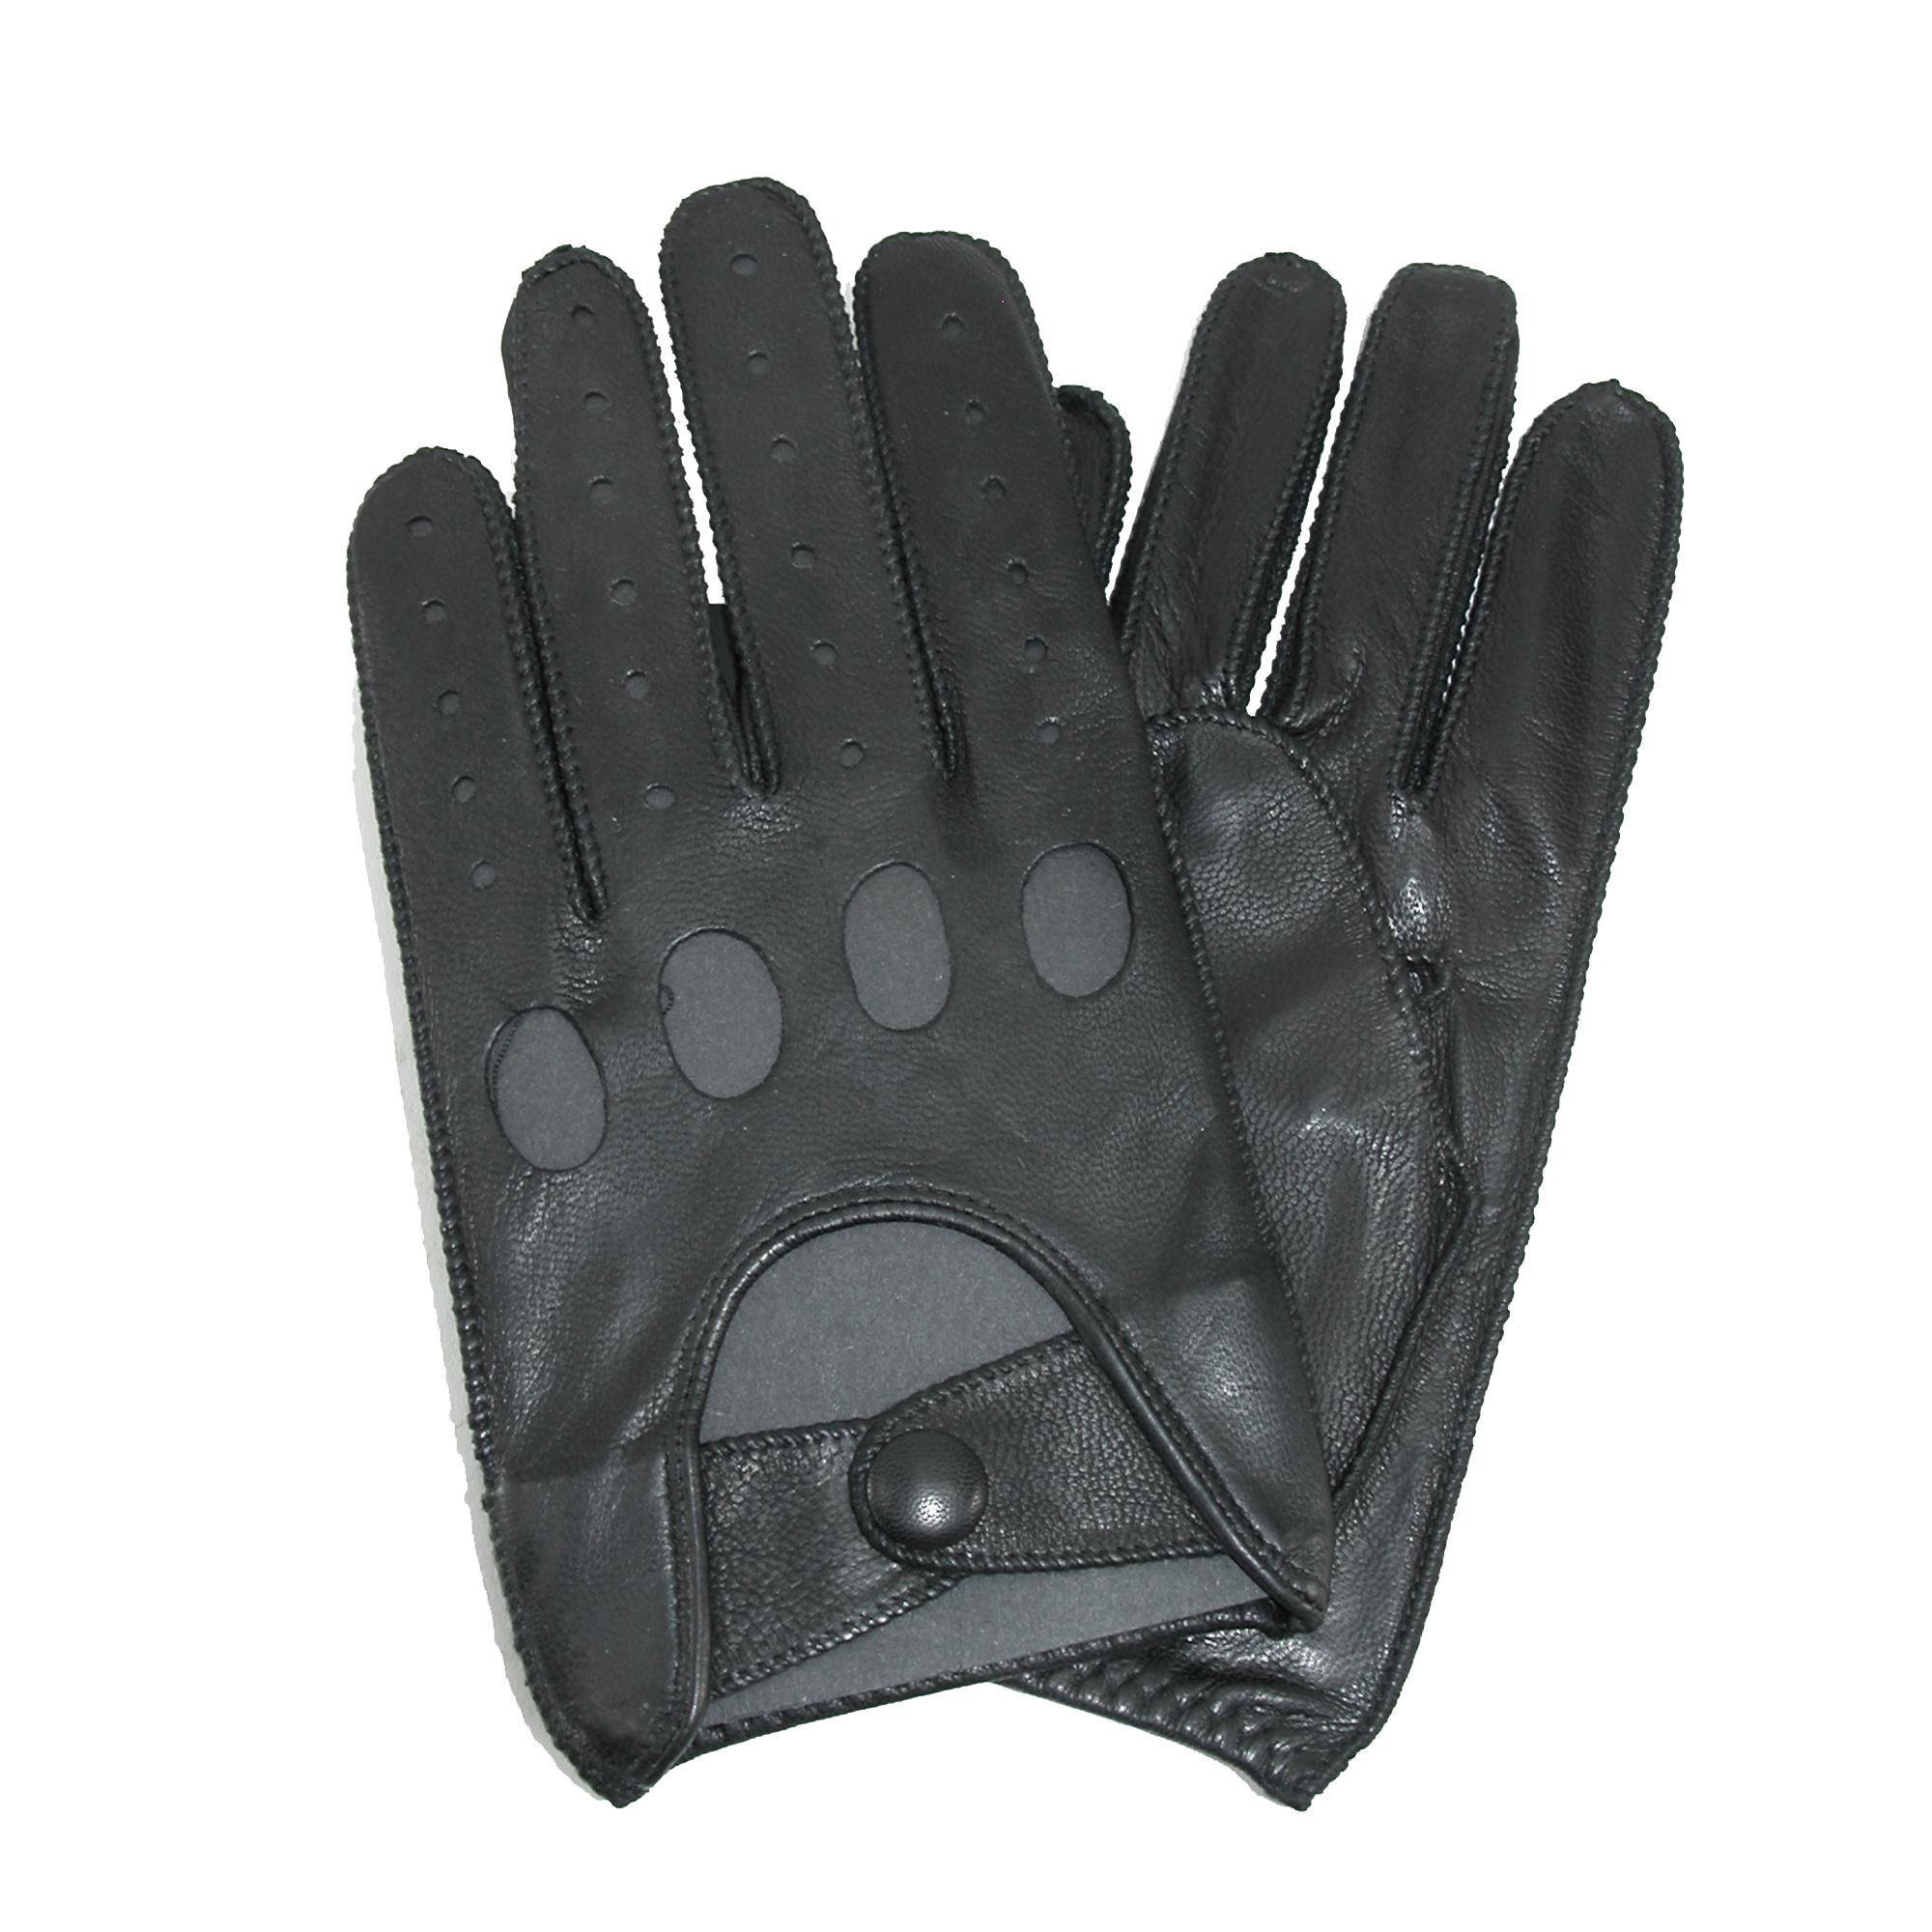 Fingerless driving gloves ebay -  Picture 3 Of 4